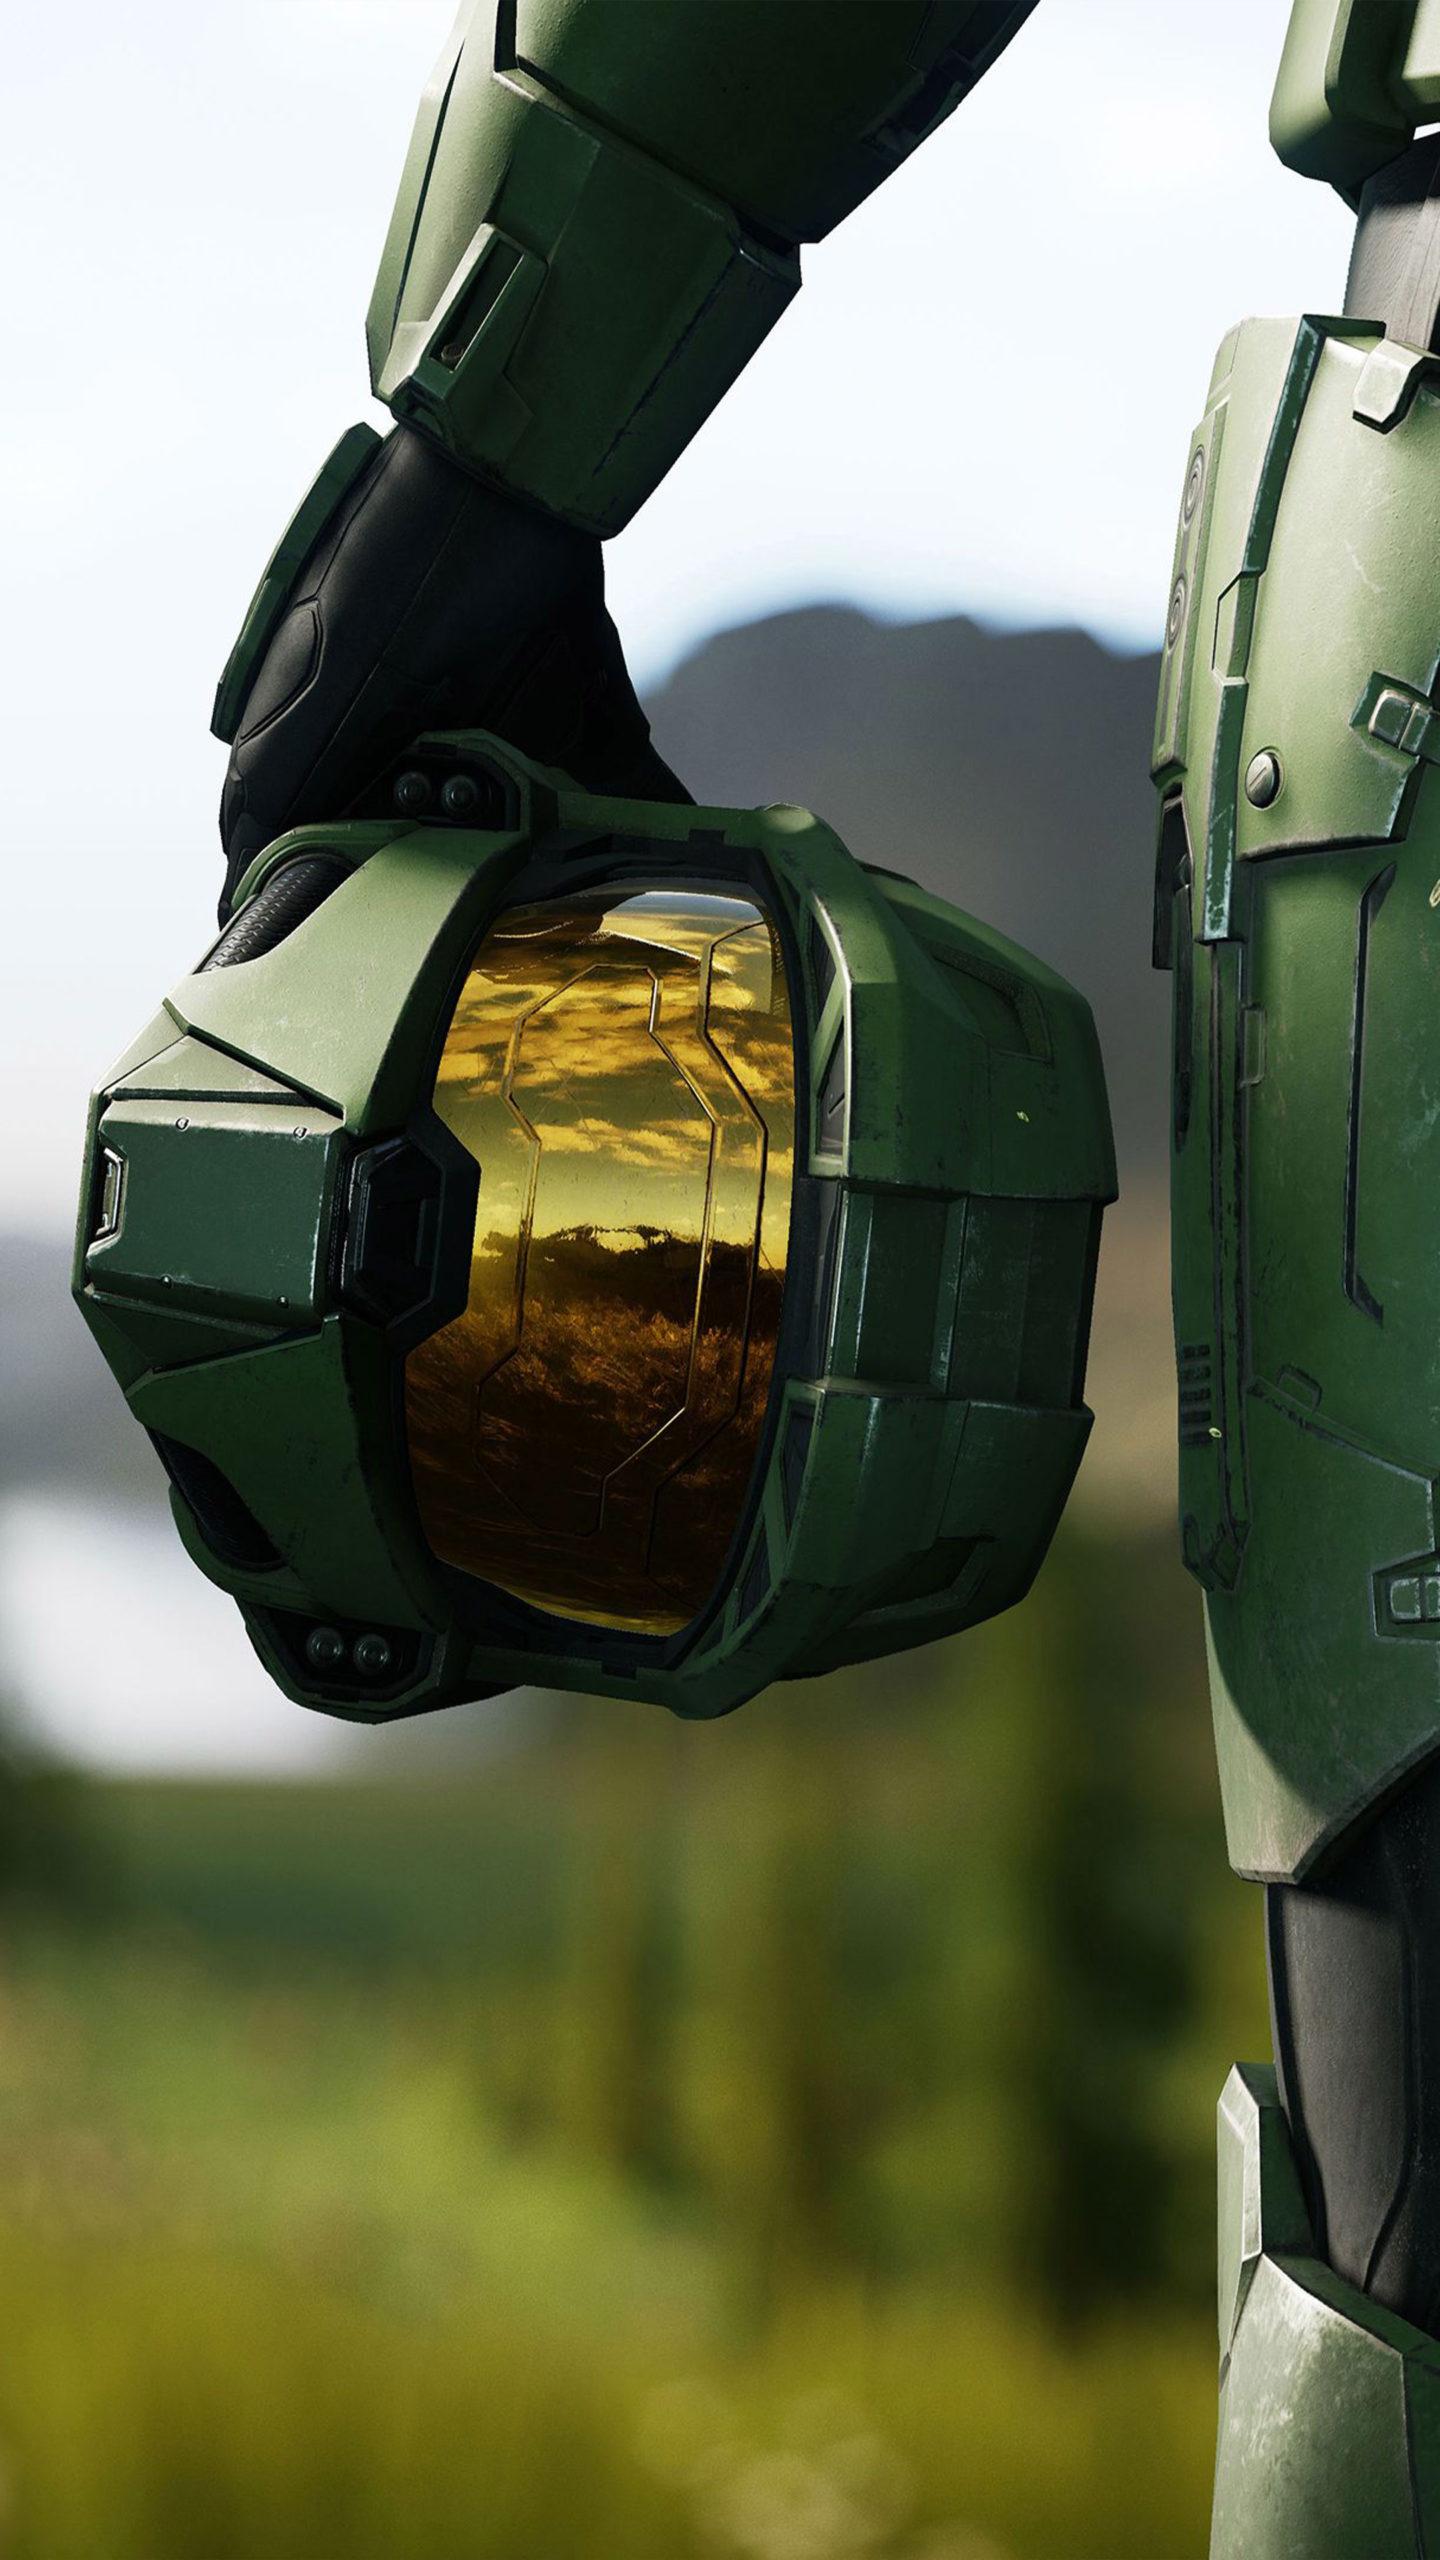 Halo Infinite 2020 Helmet 4K Ultra HD Mobile Wallpaper